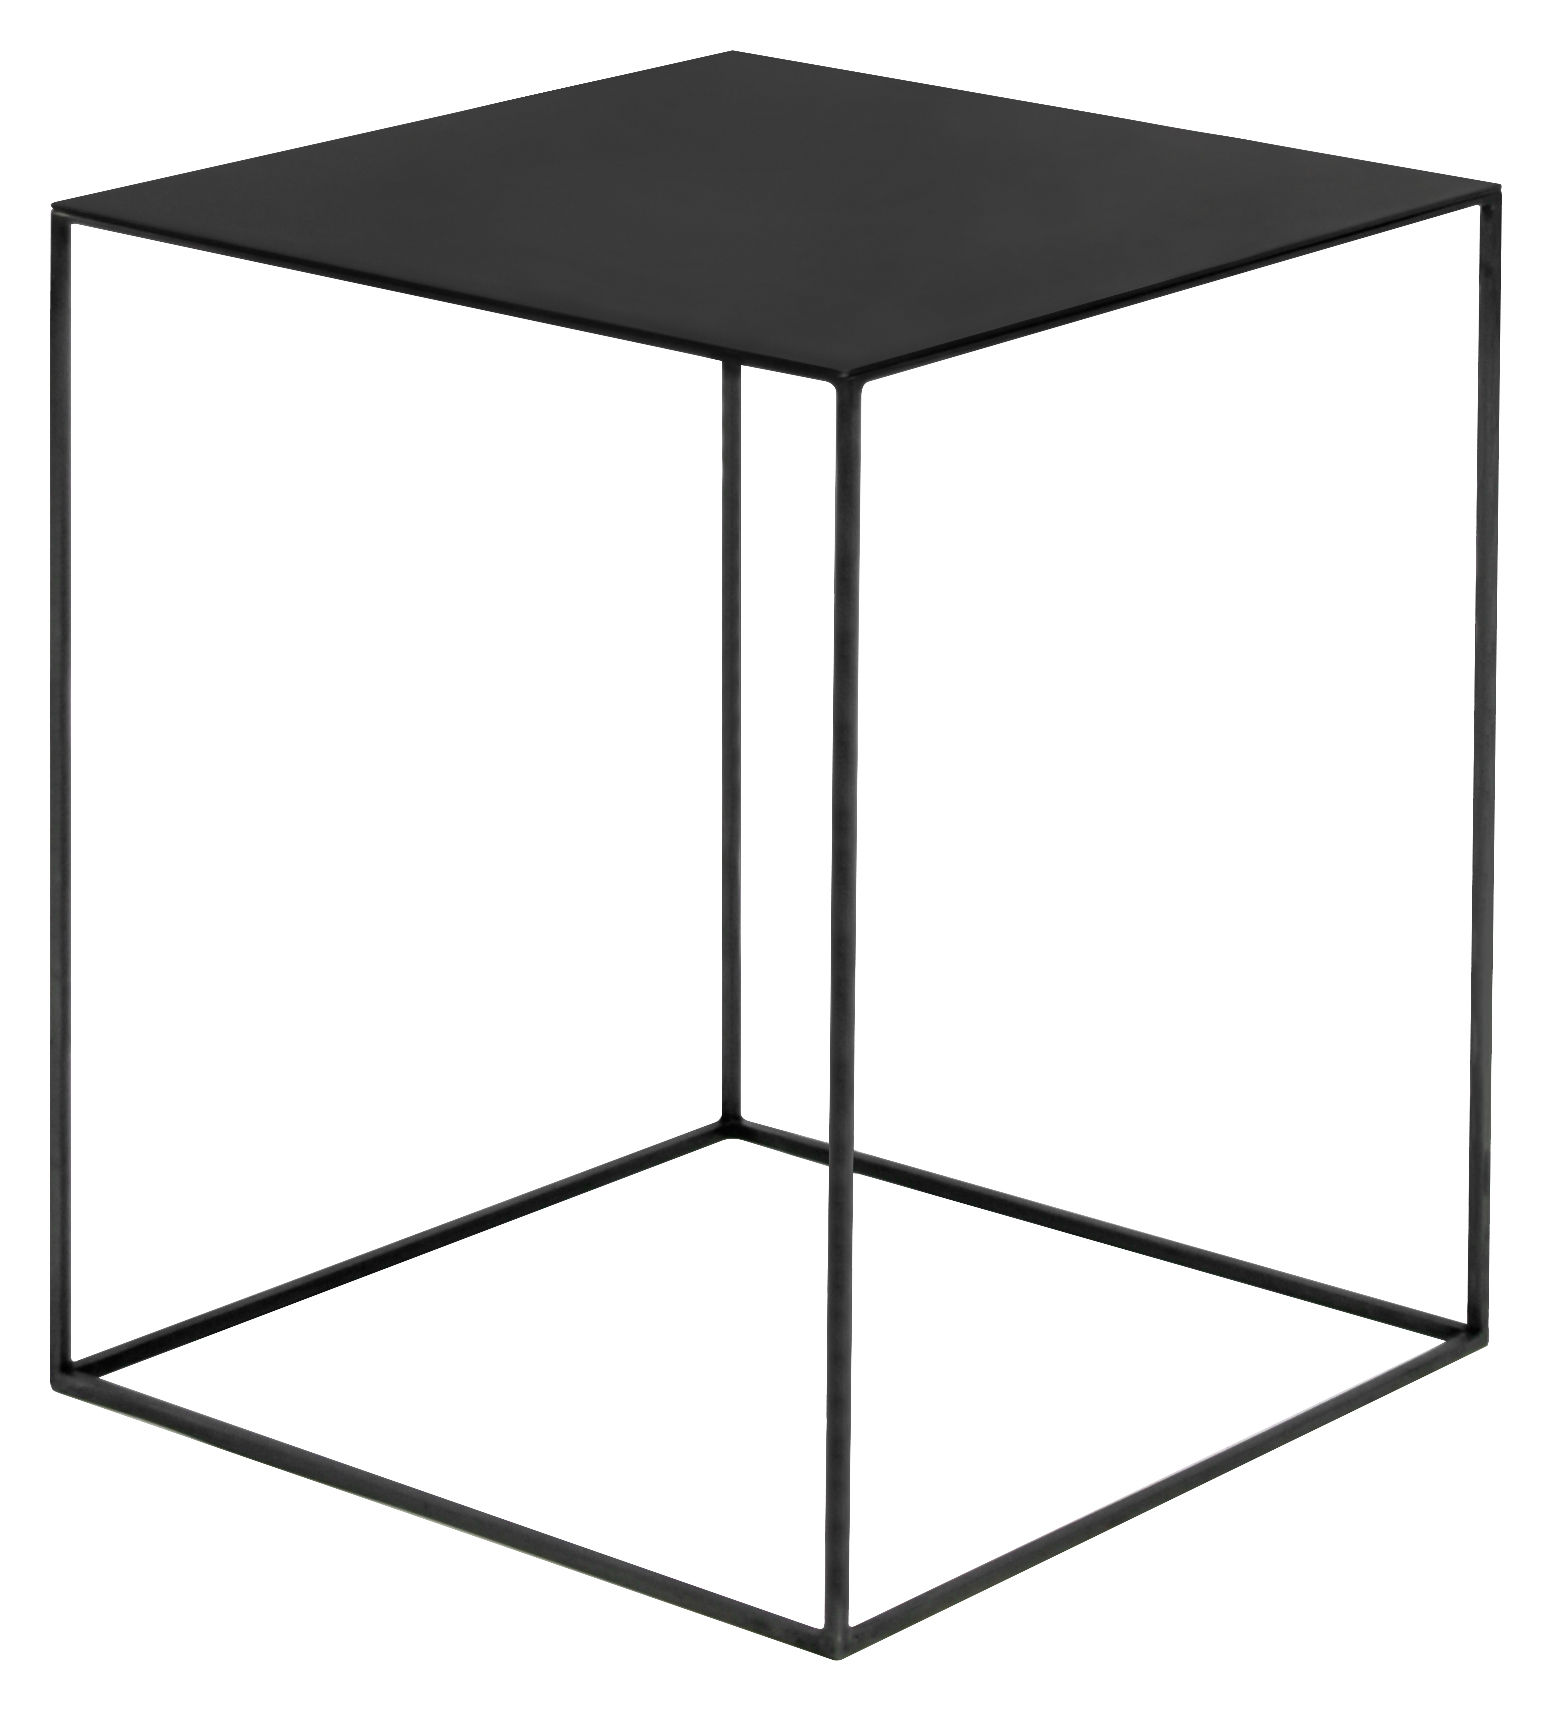 Furniture - Coffee Tables - Slim Irony Coffee table by Zeus - Black steel - Steel